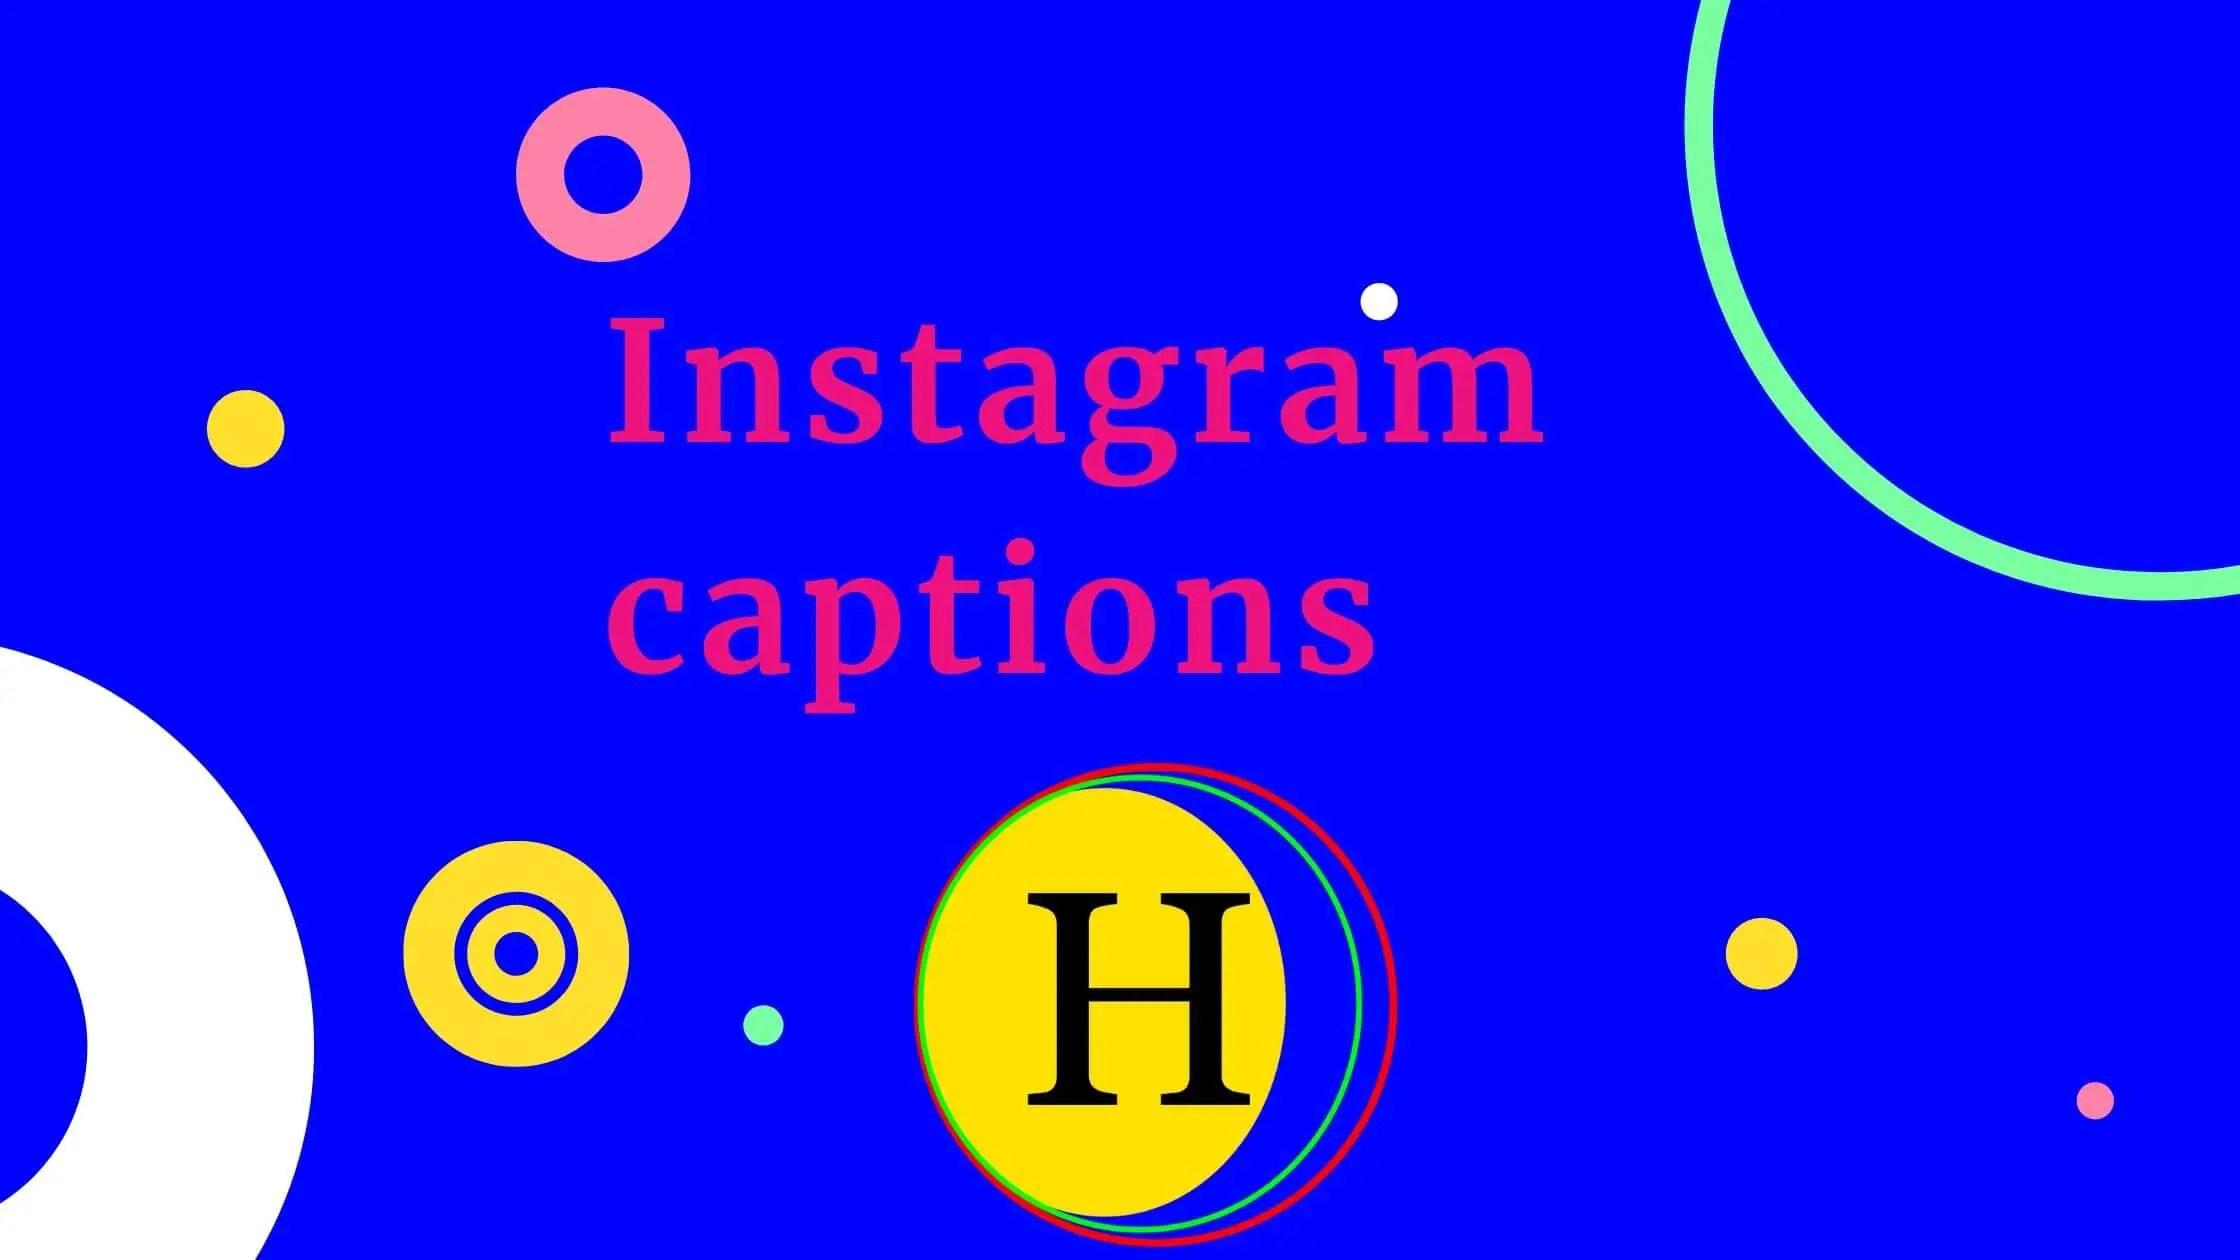 Best Instagram caption